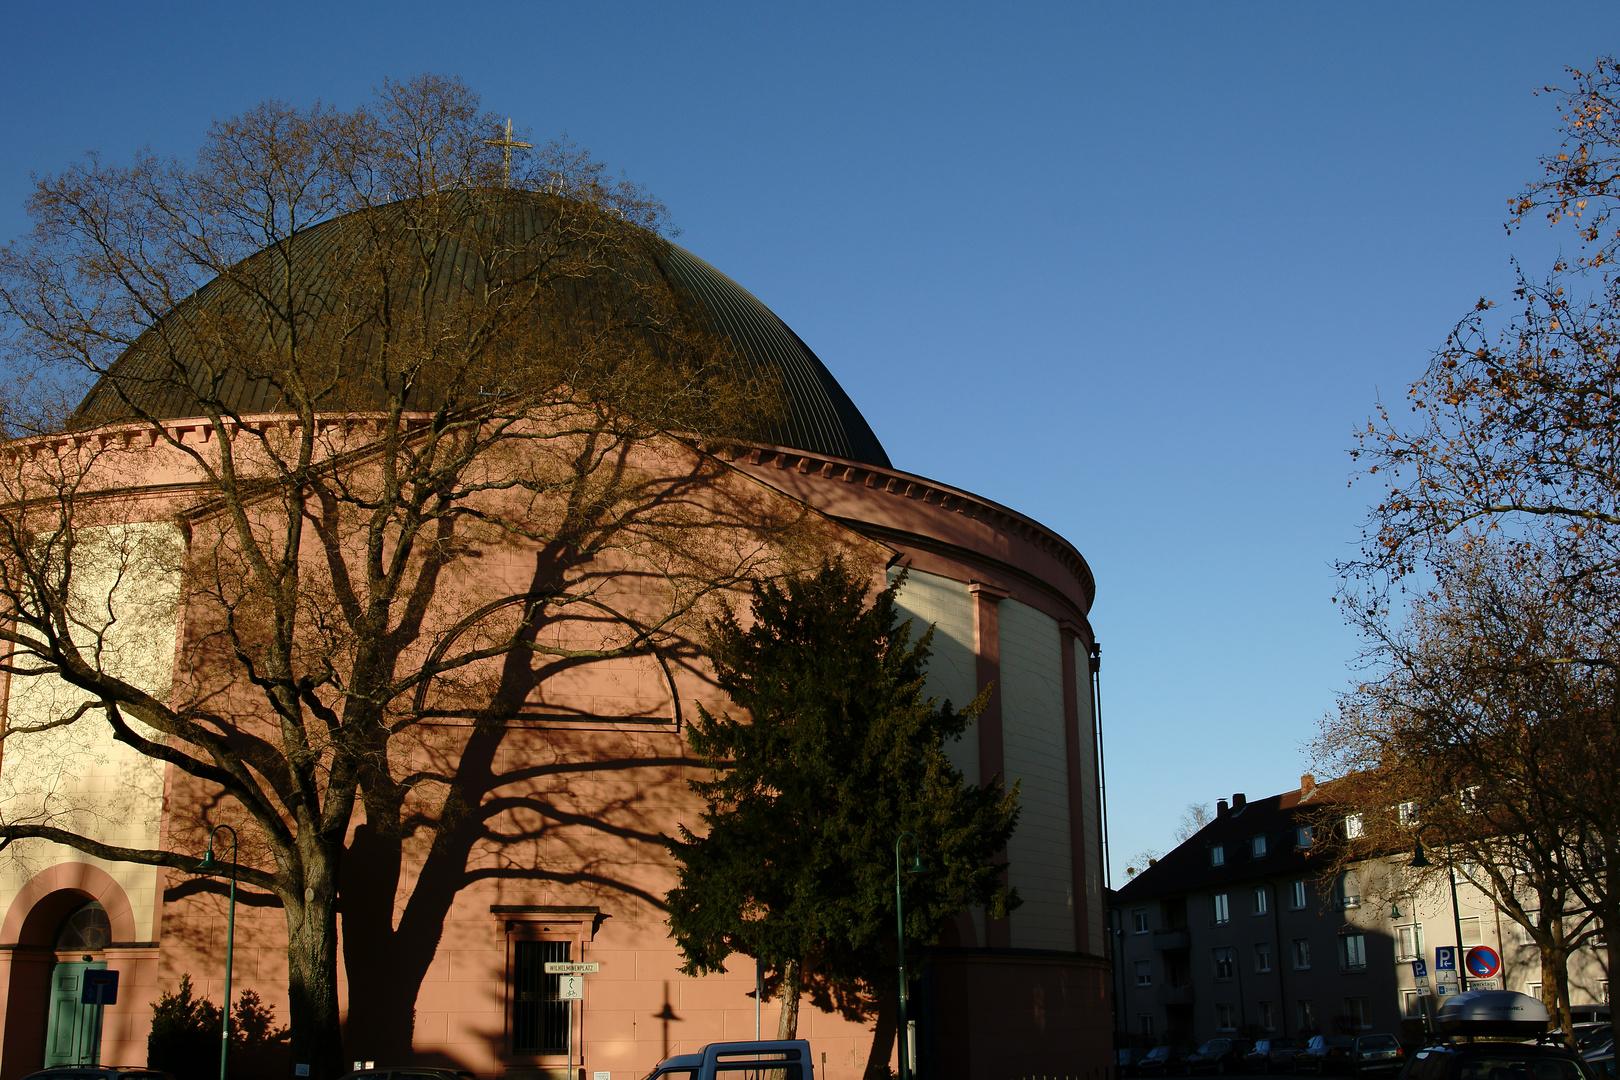 St. Ludwigskirche